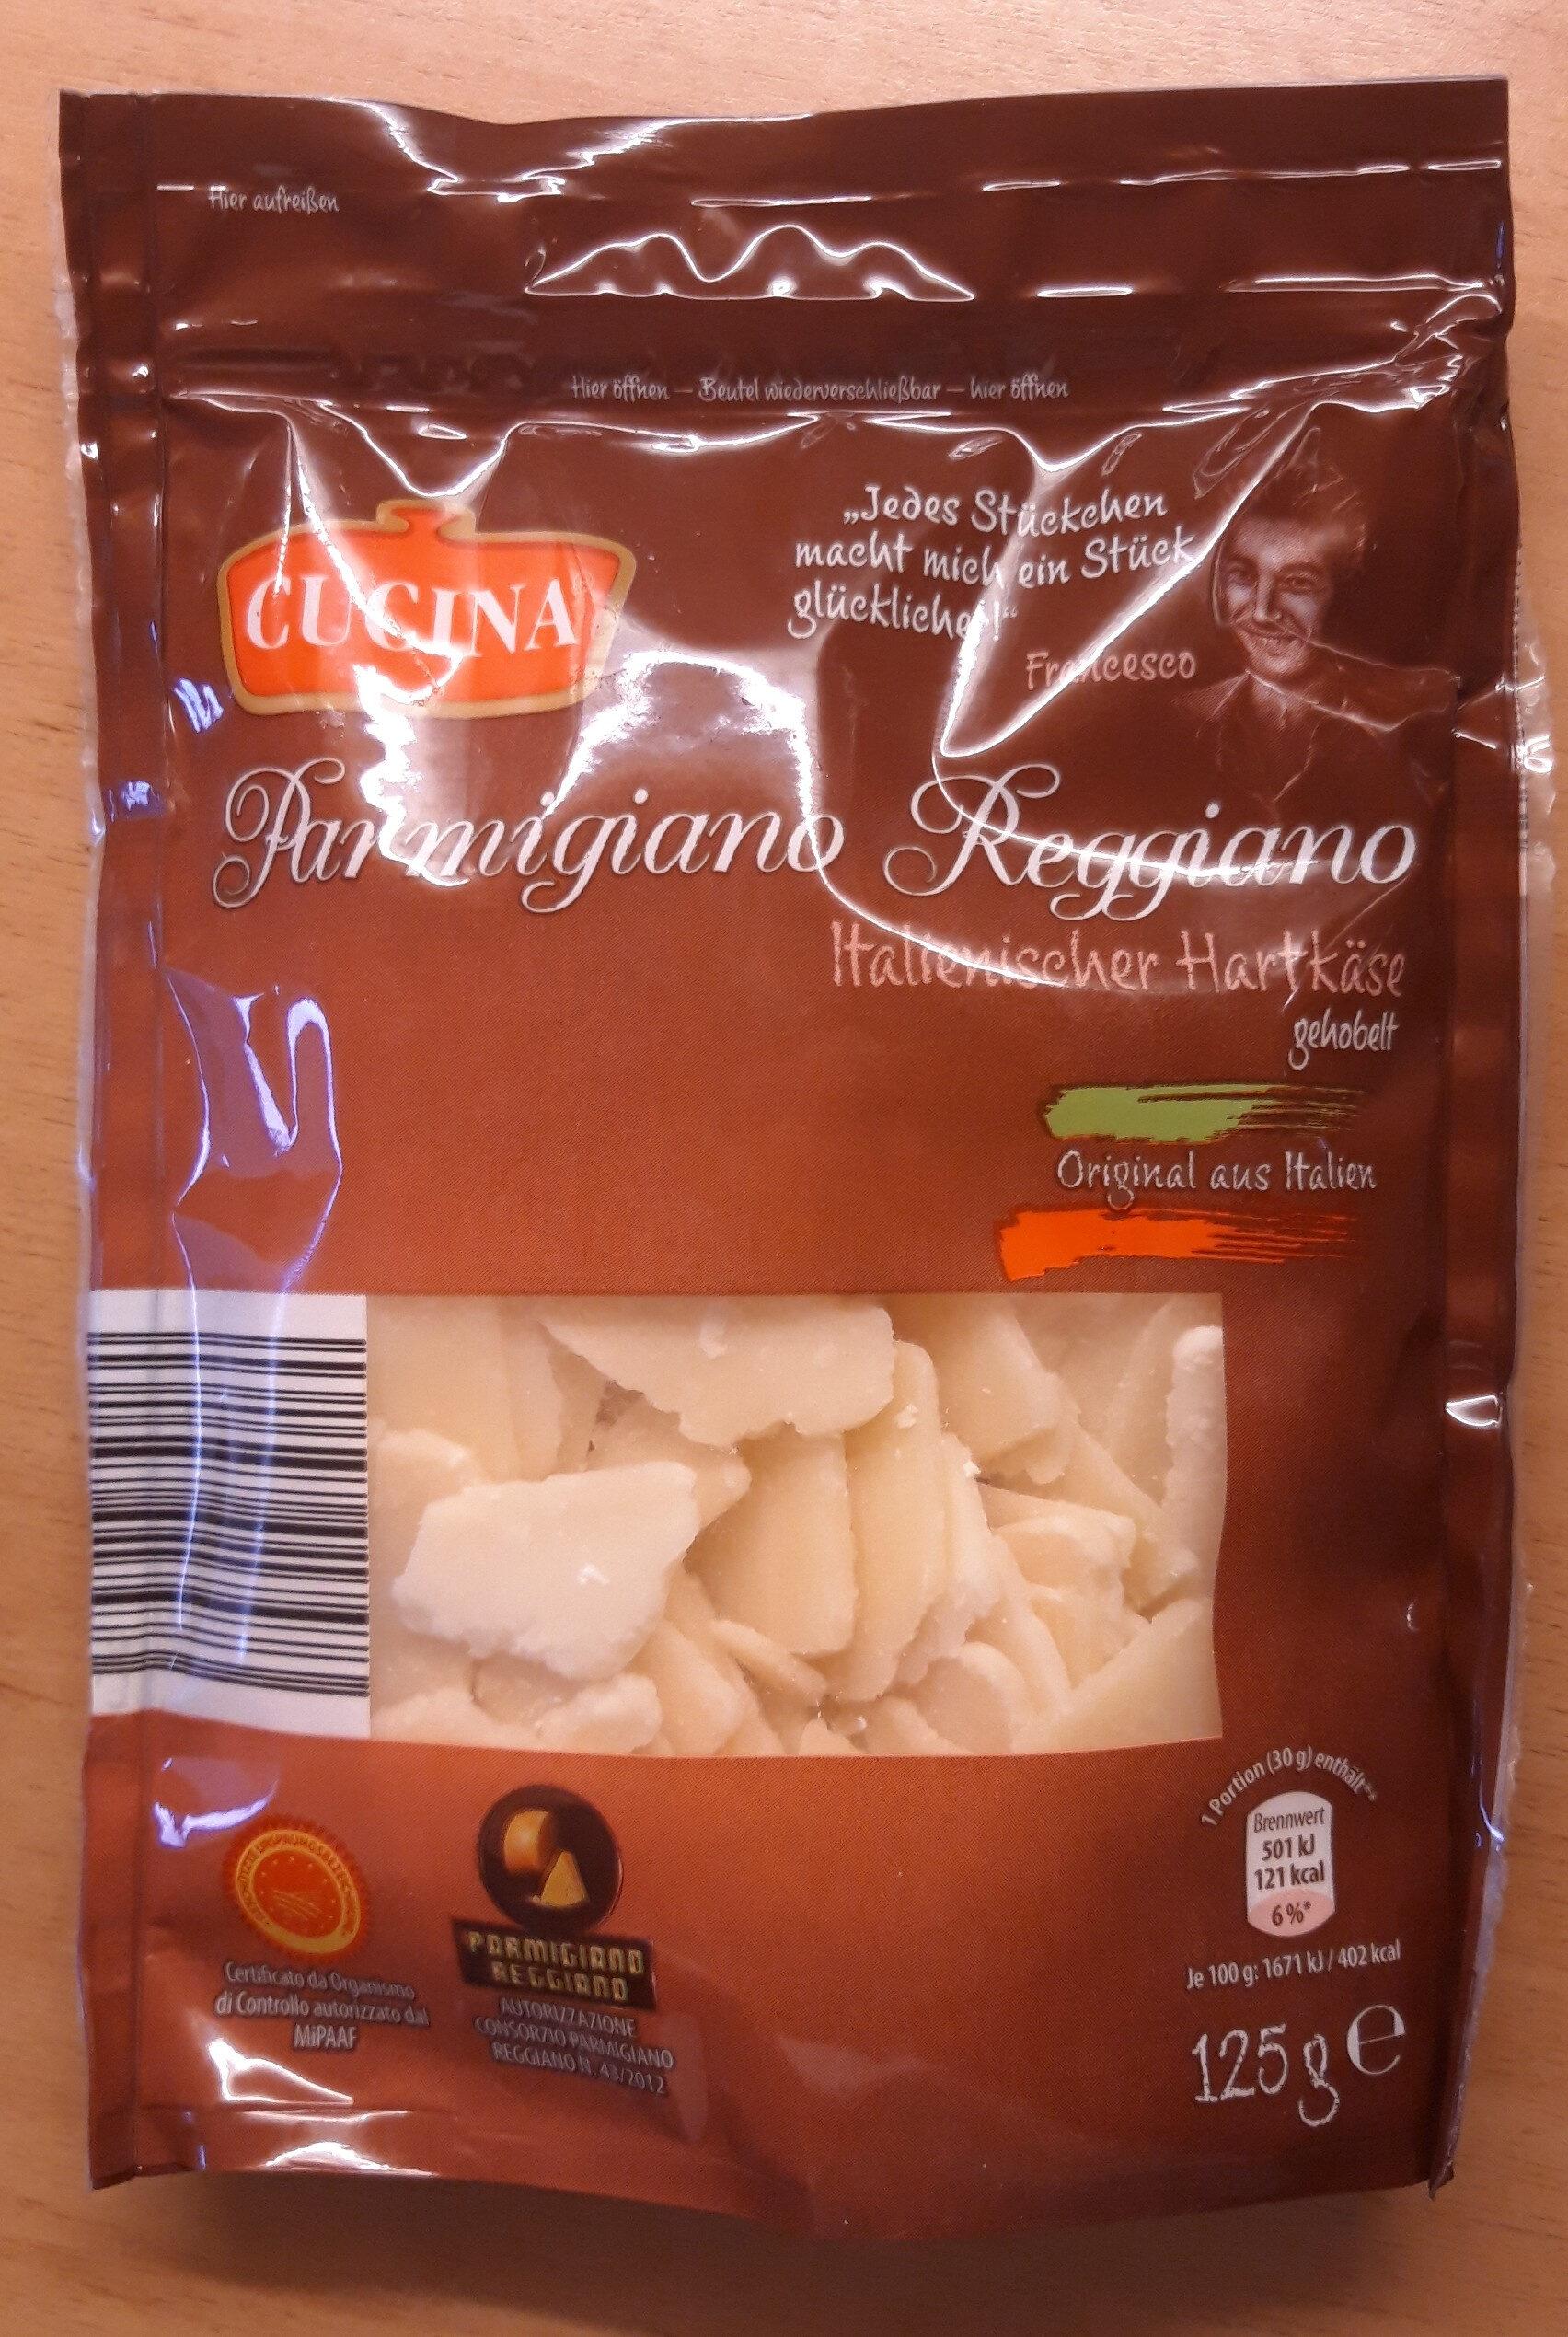 Parmigiano Reggiano Italienischer Hartkäse - Product